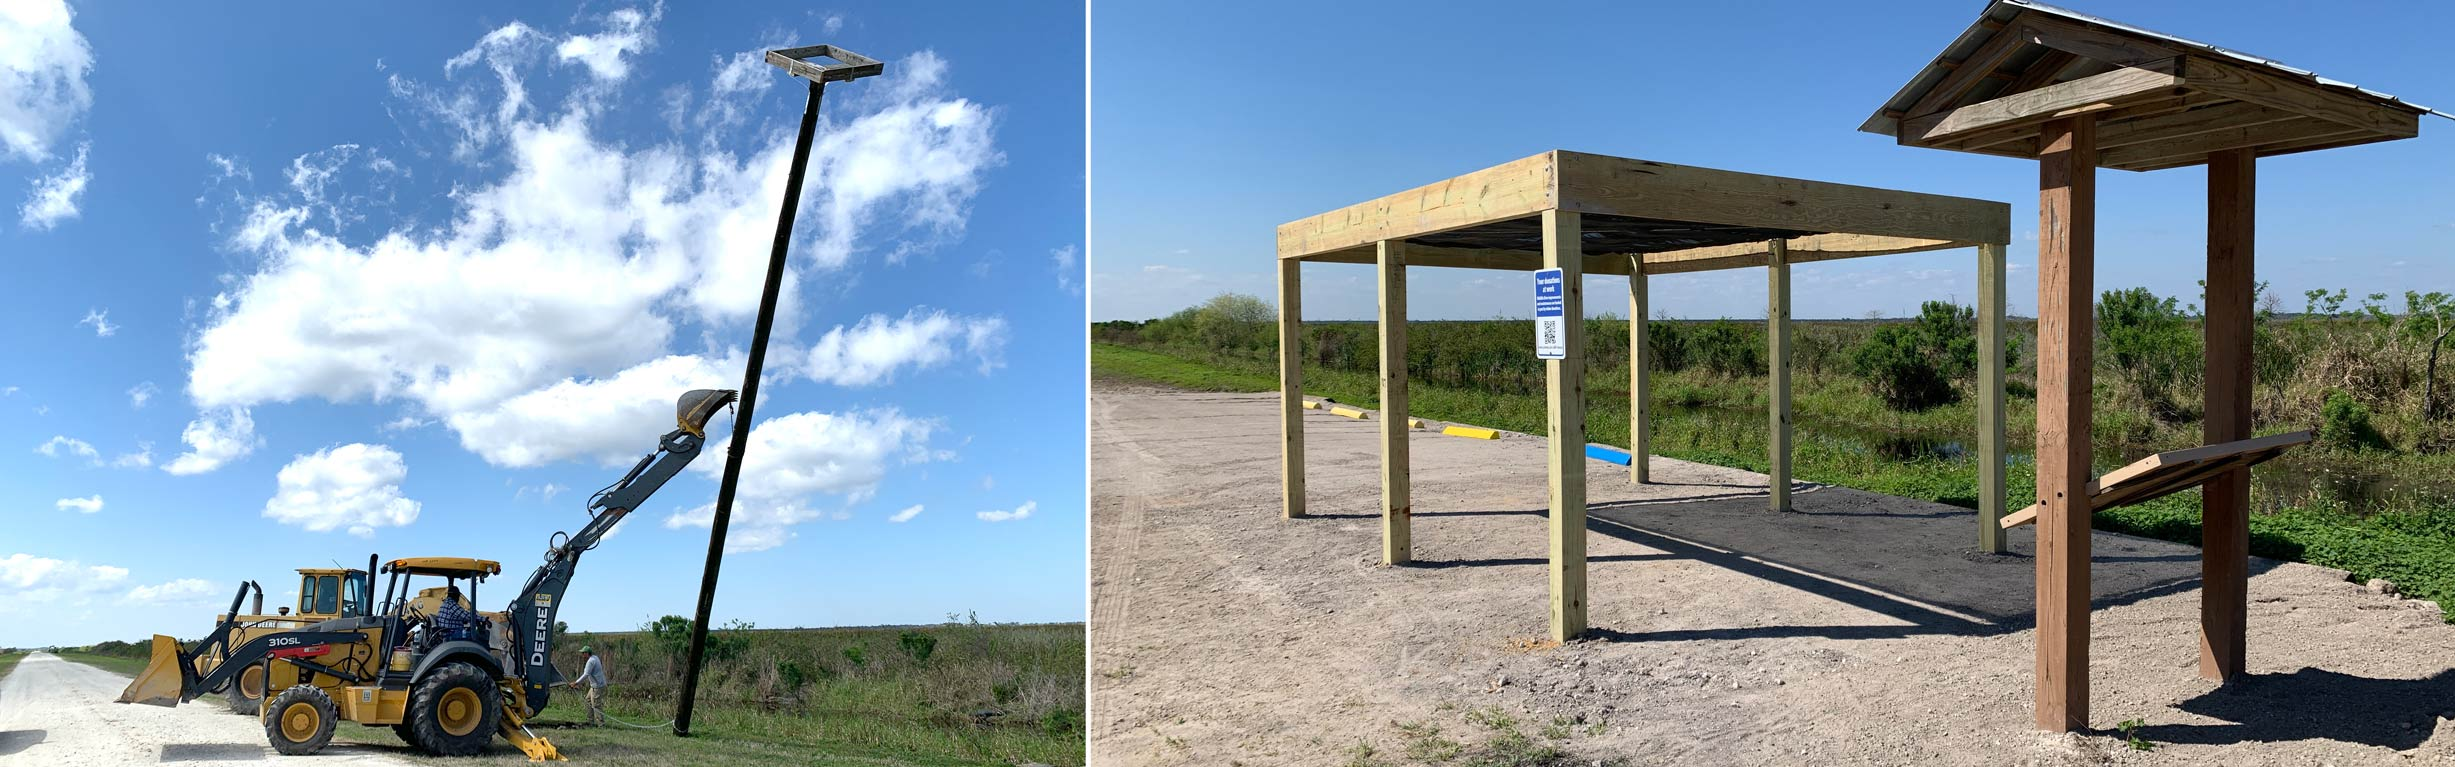 Construction of osprey platform and picnic parking area